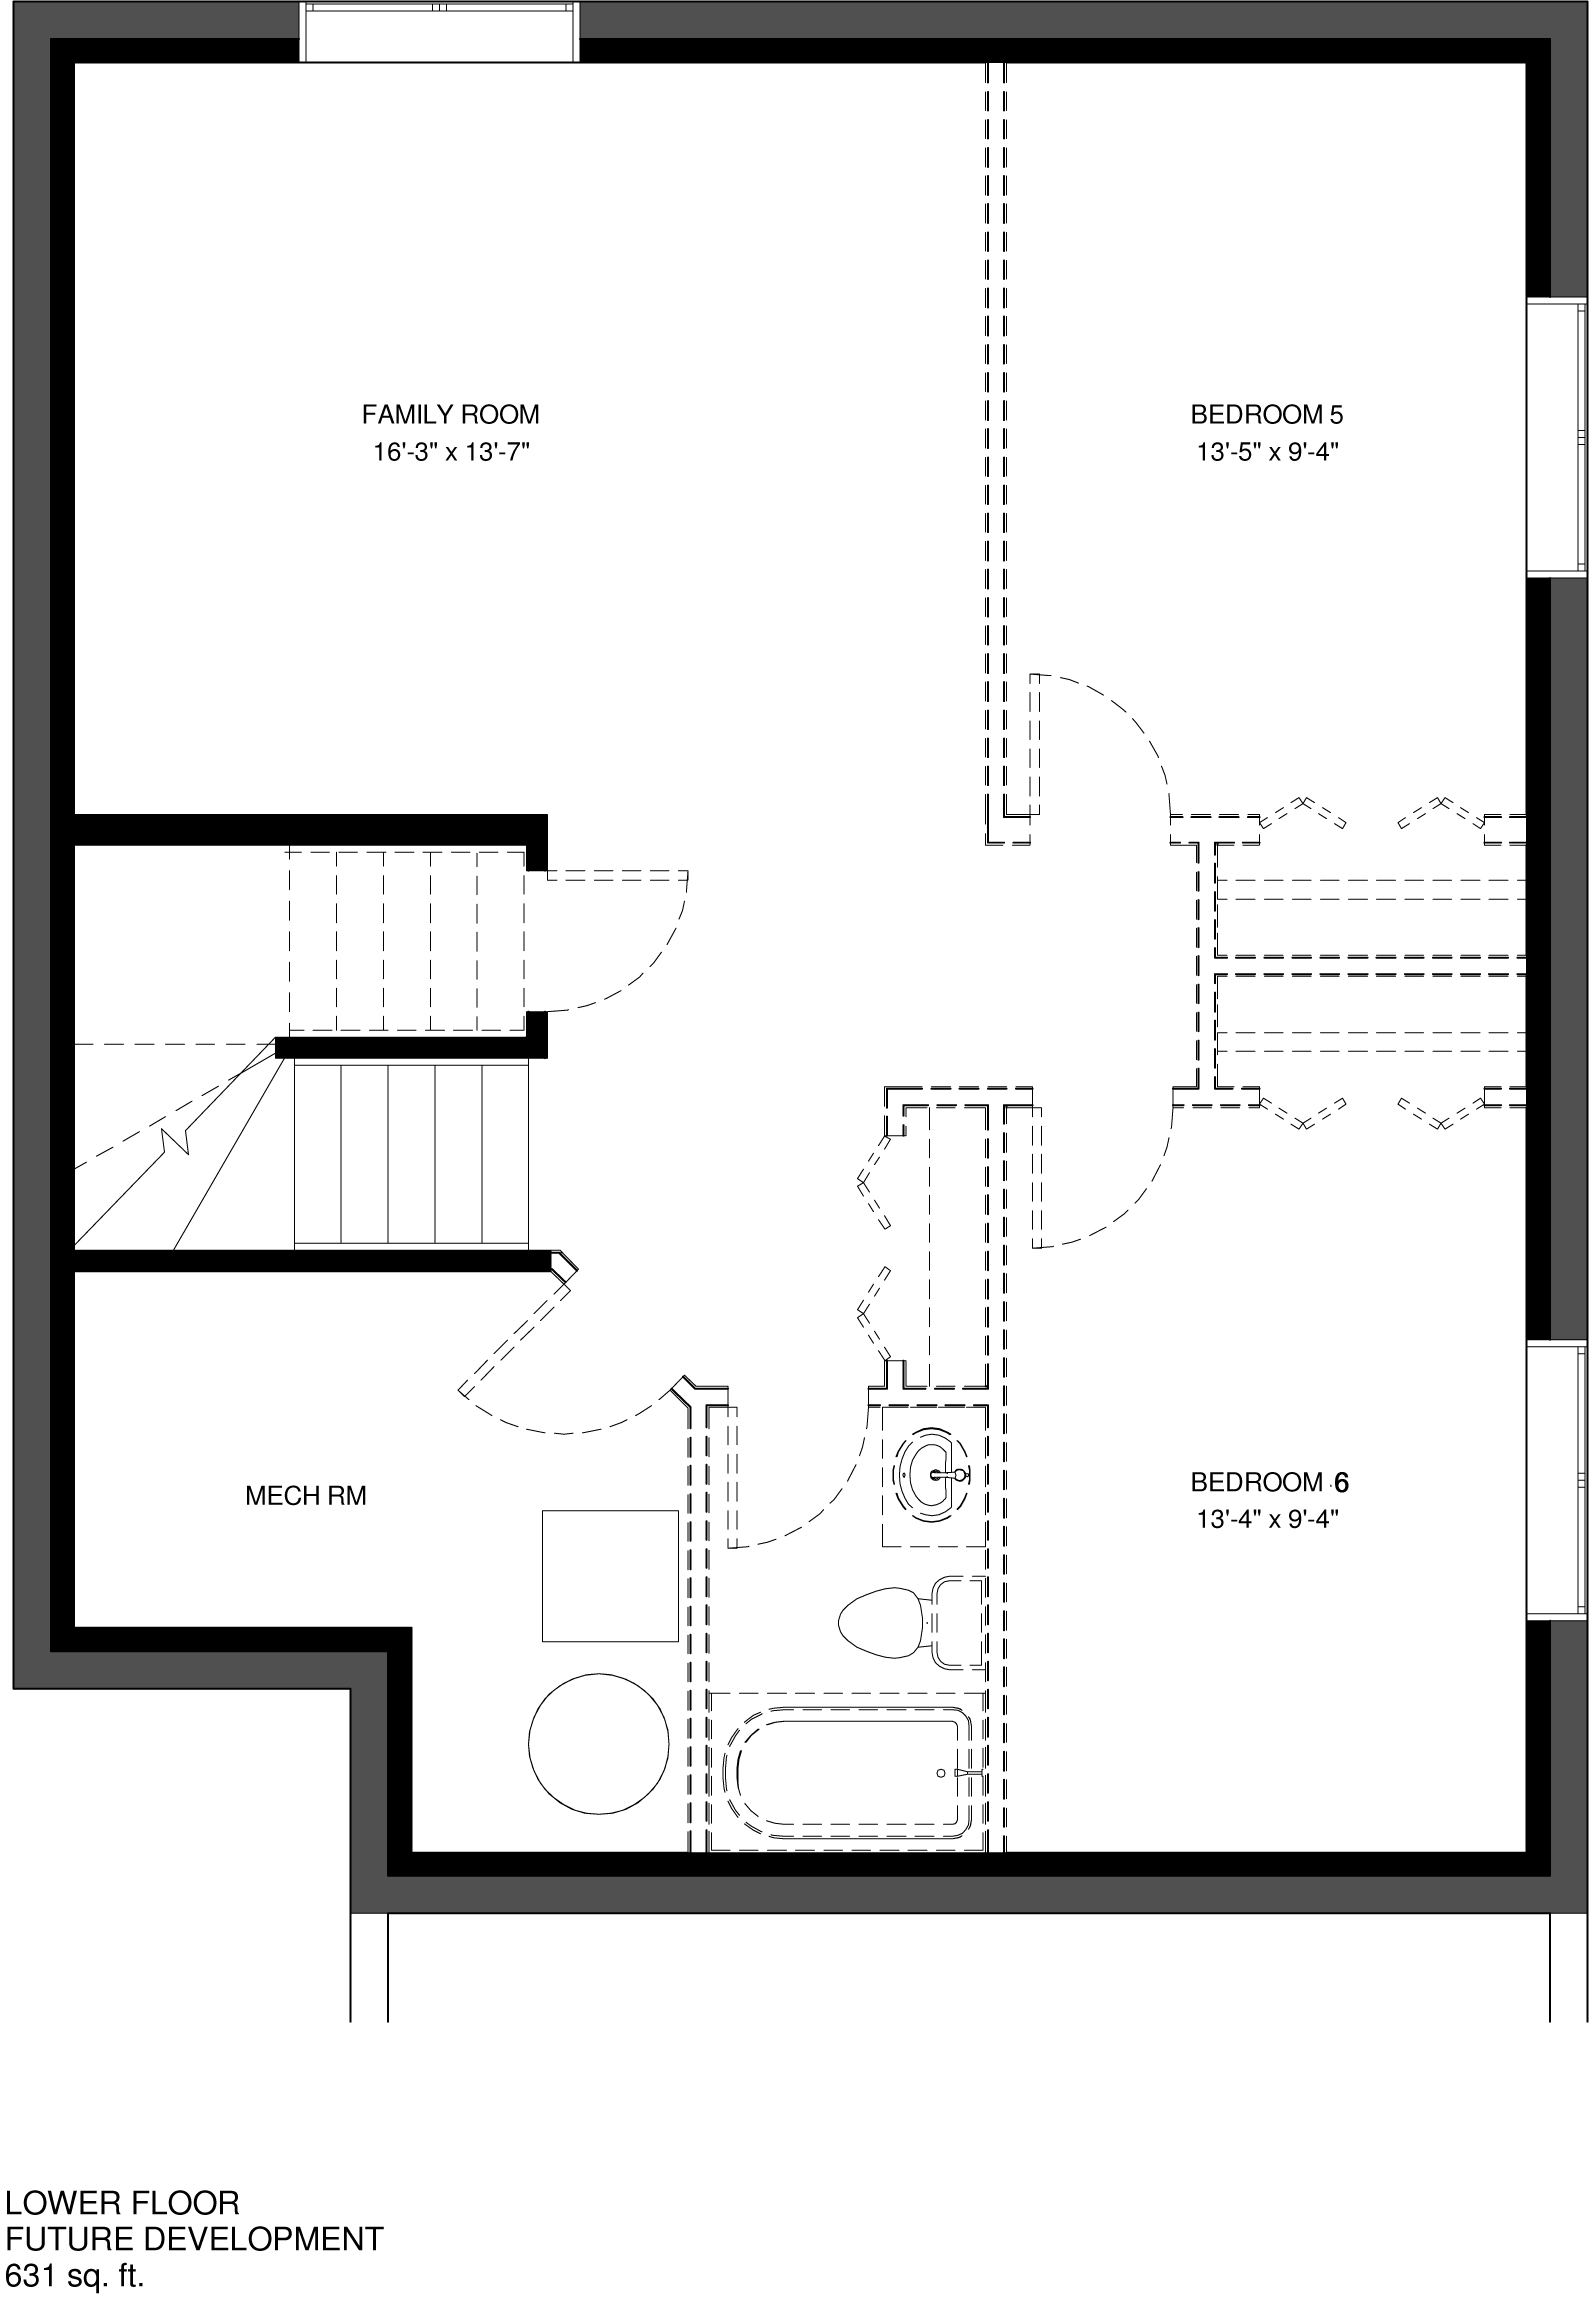 Lower Floor Future Development   631 sq ft